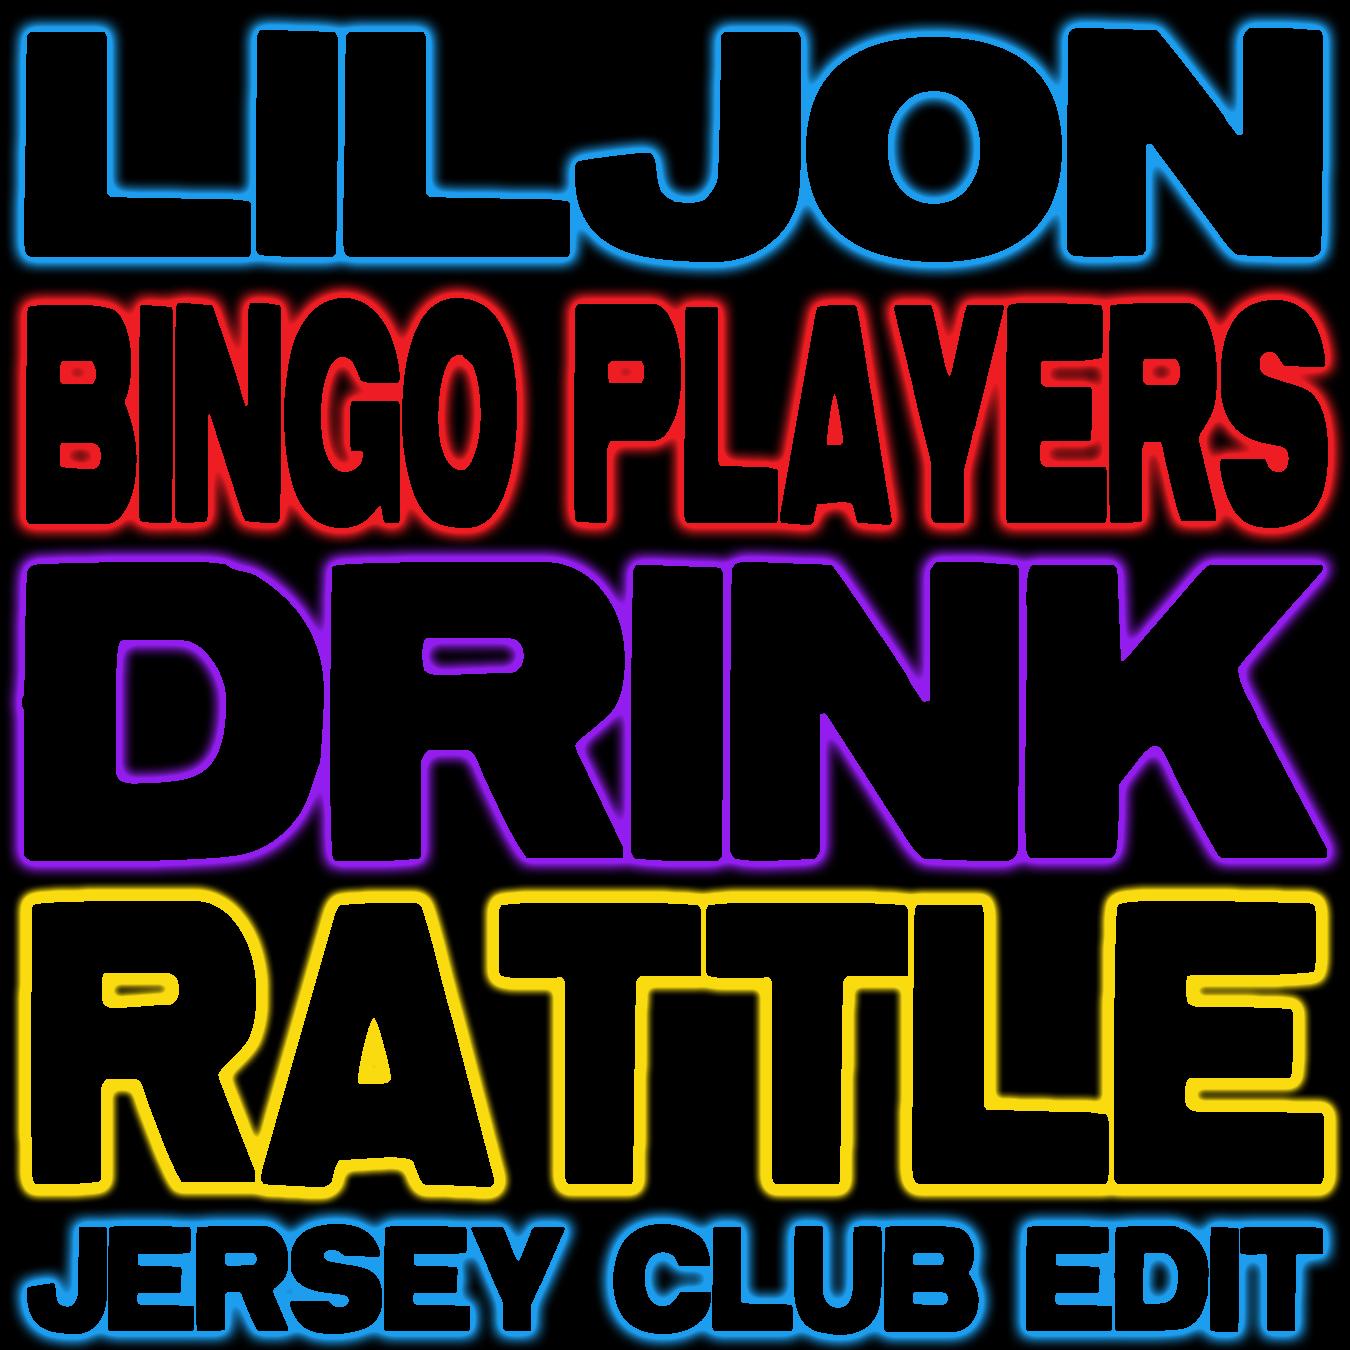 Bingo Players x TEEZ x Lil Jon x DJ Kontrol x LMFAO - Drink Rattle (Jersey Club Edit)